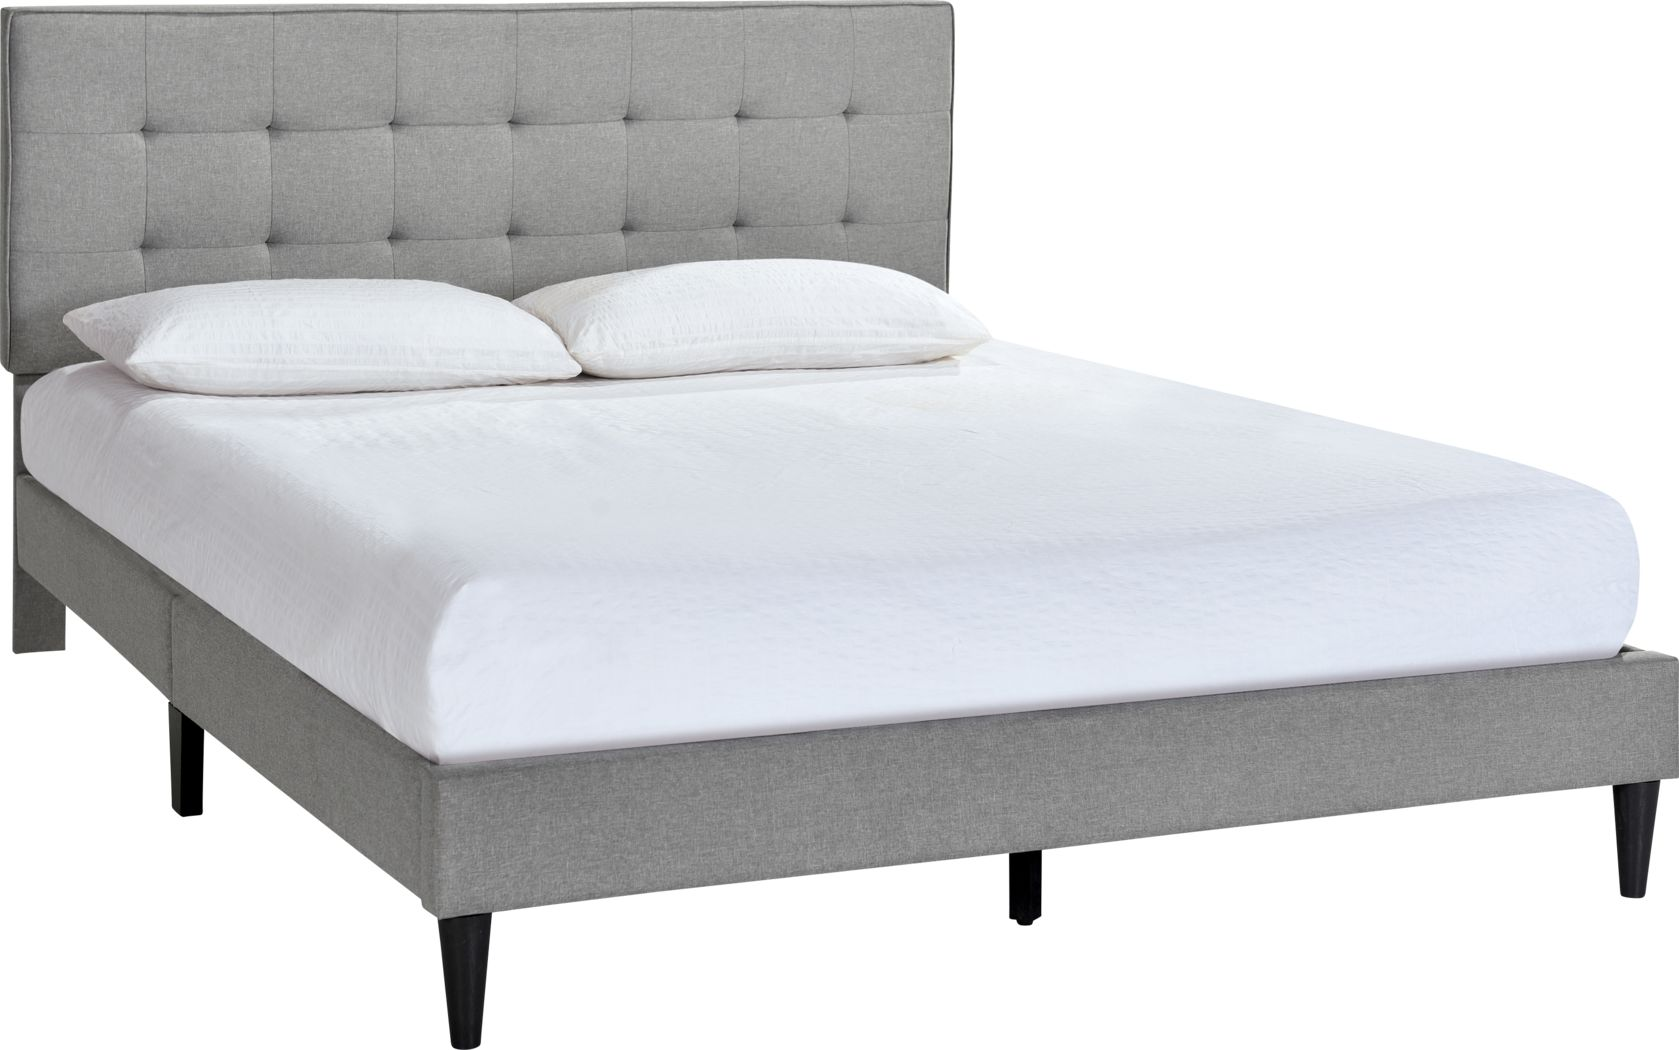 Lousetown Gray King Bed